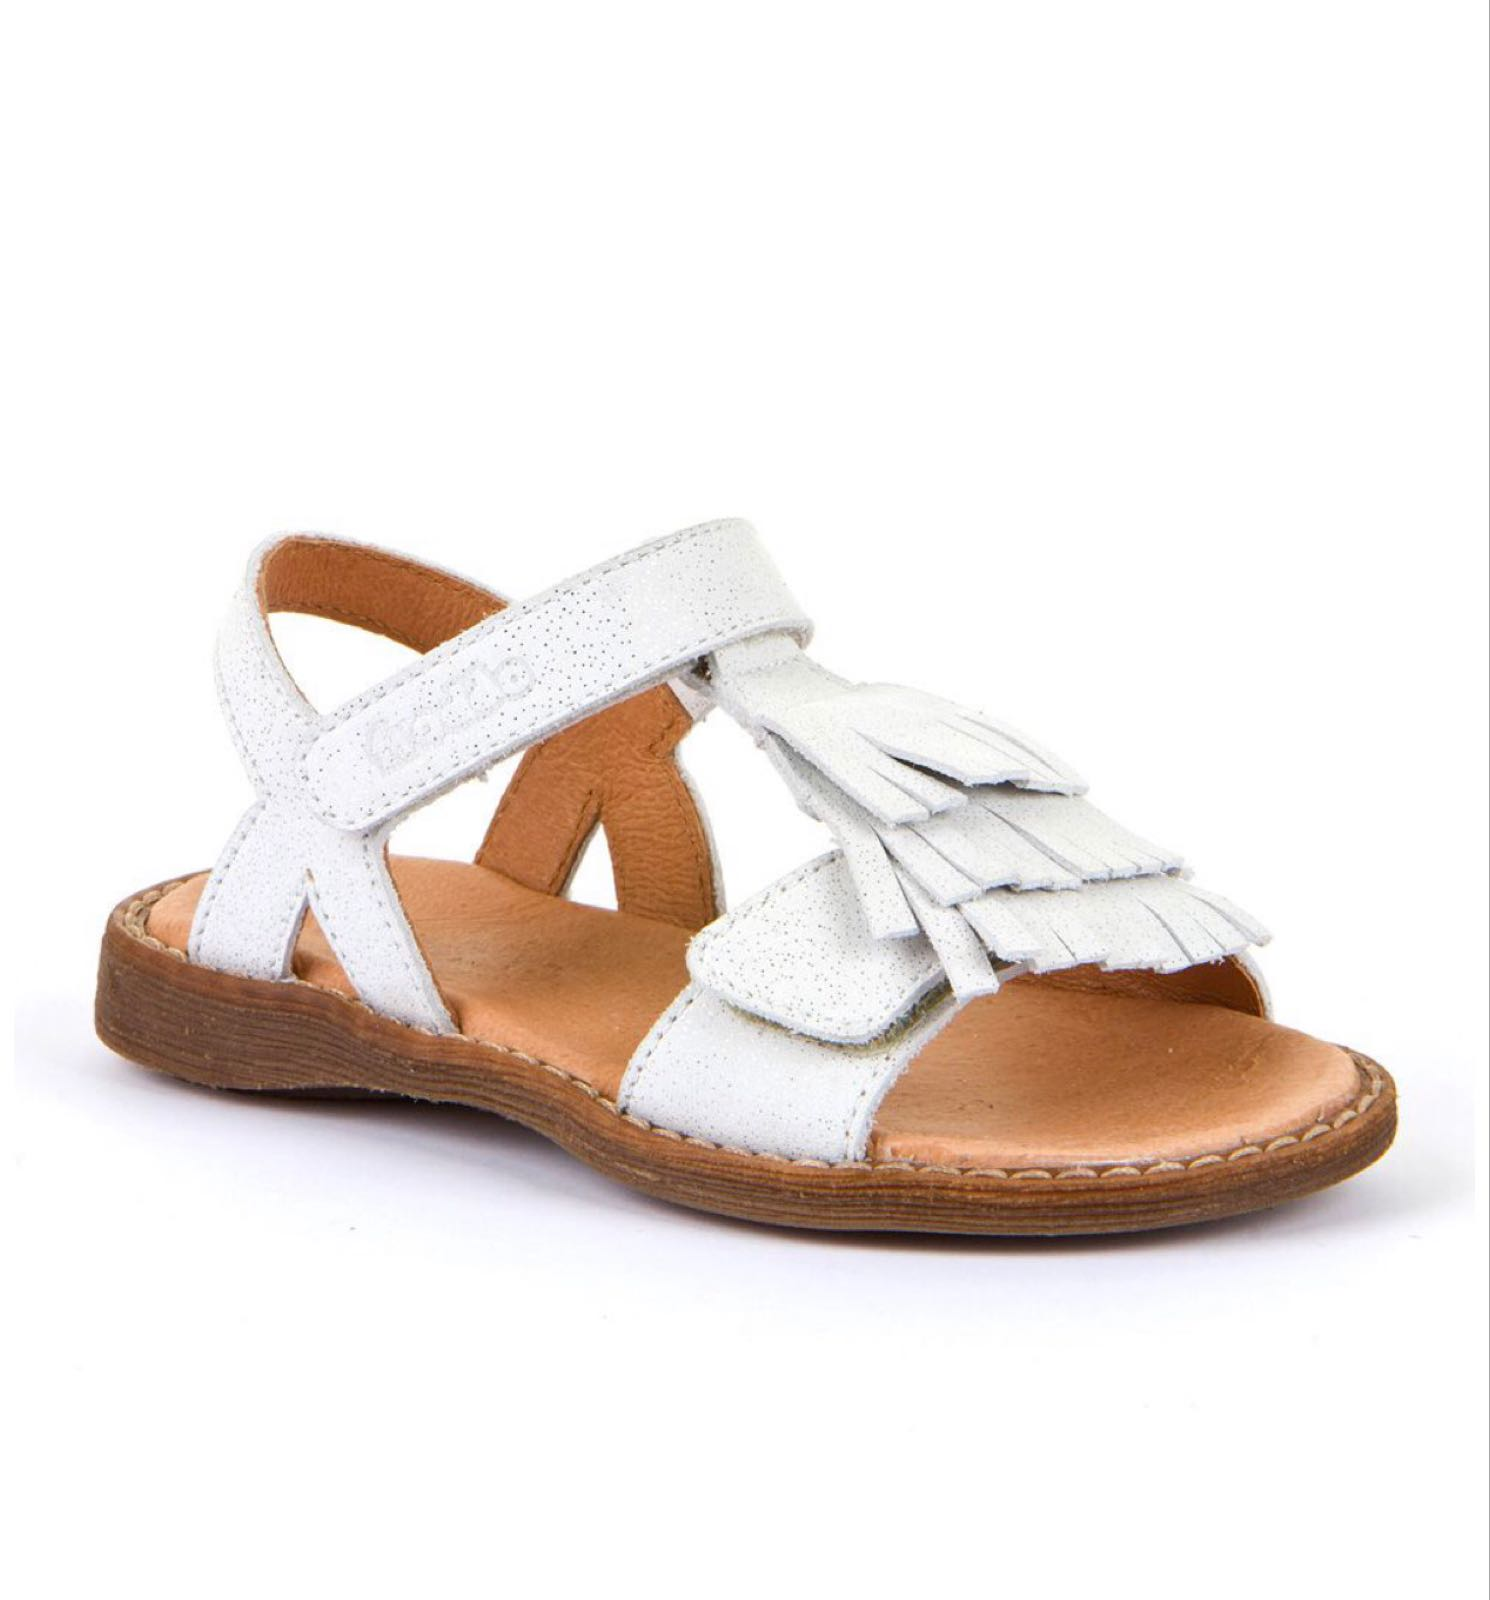 FRODDO Sandals G3150182-1